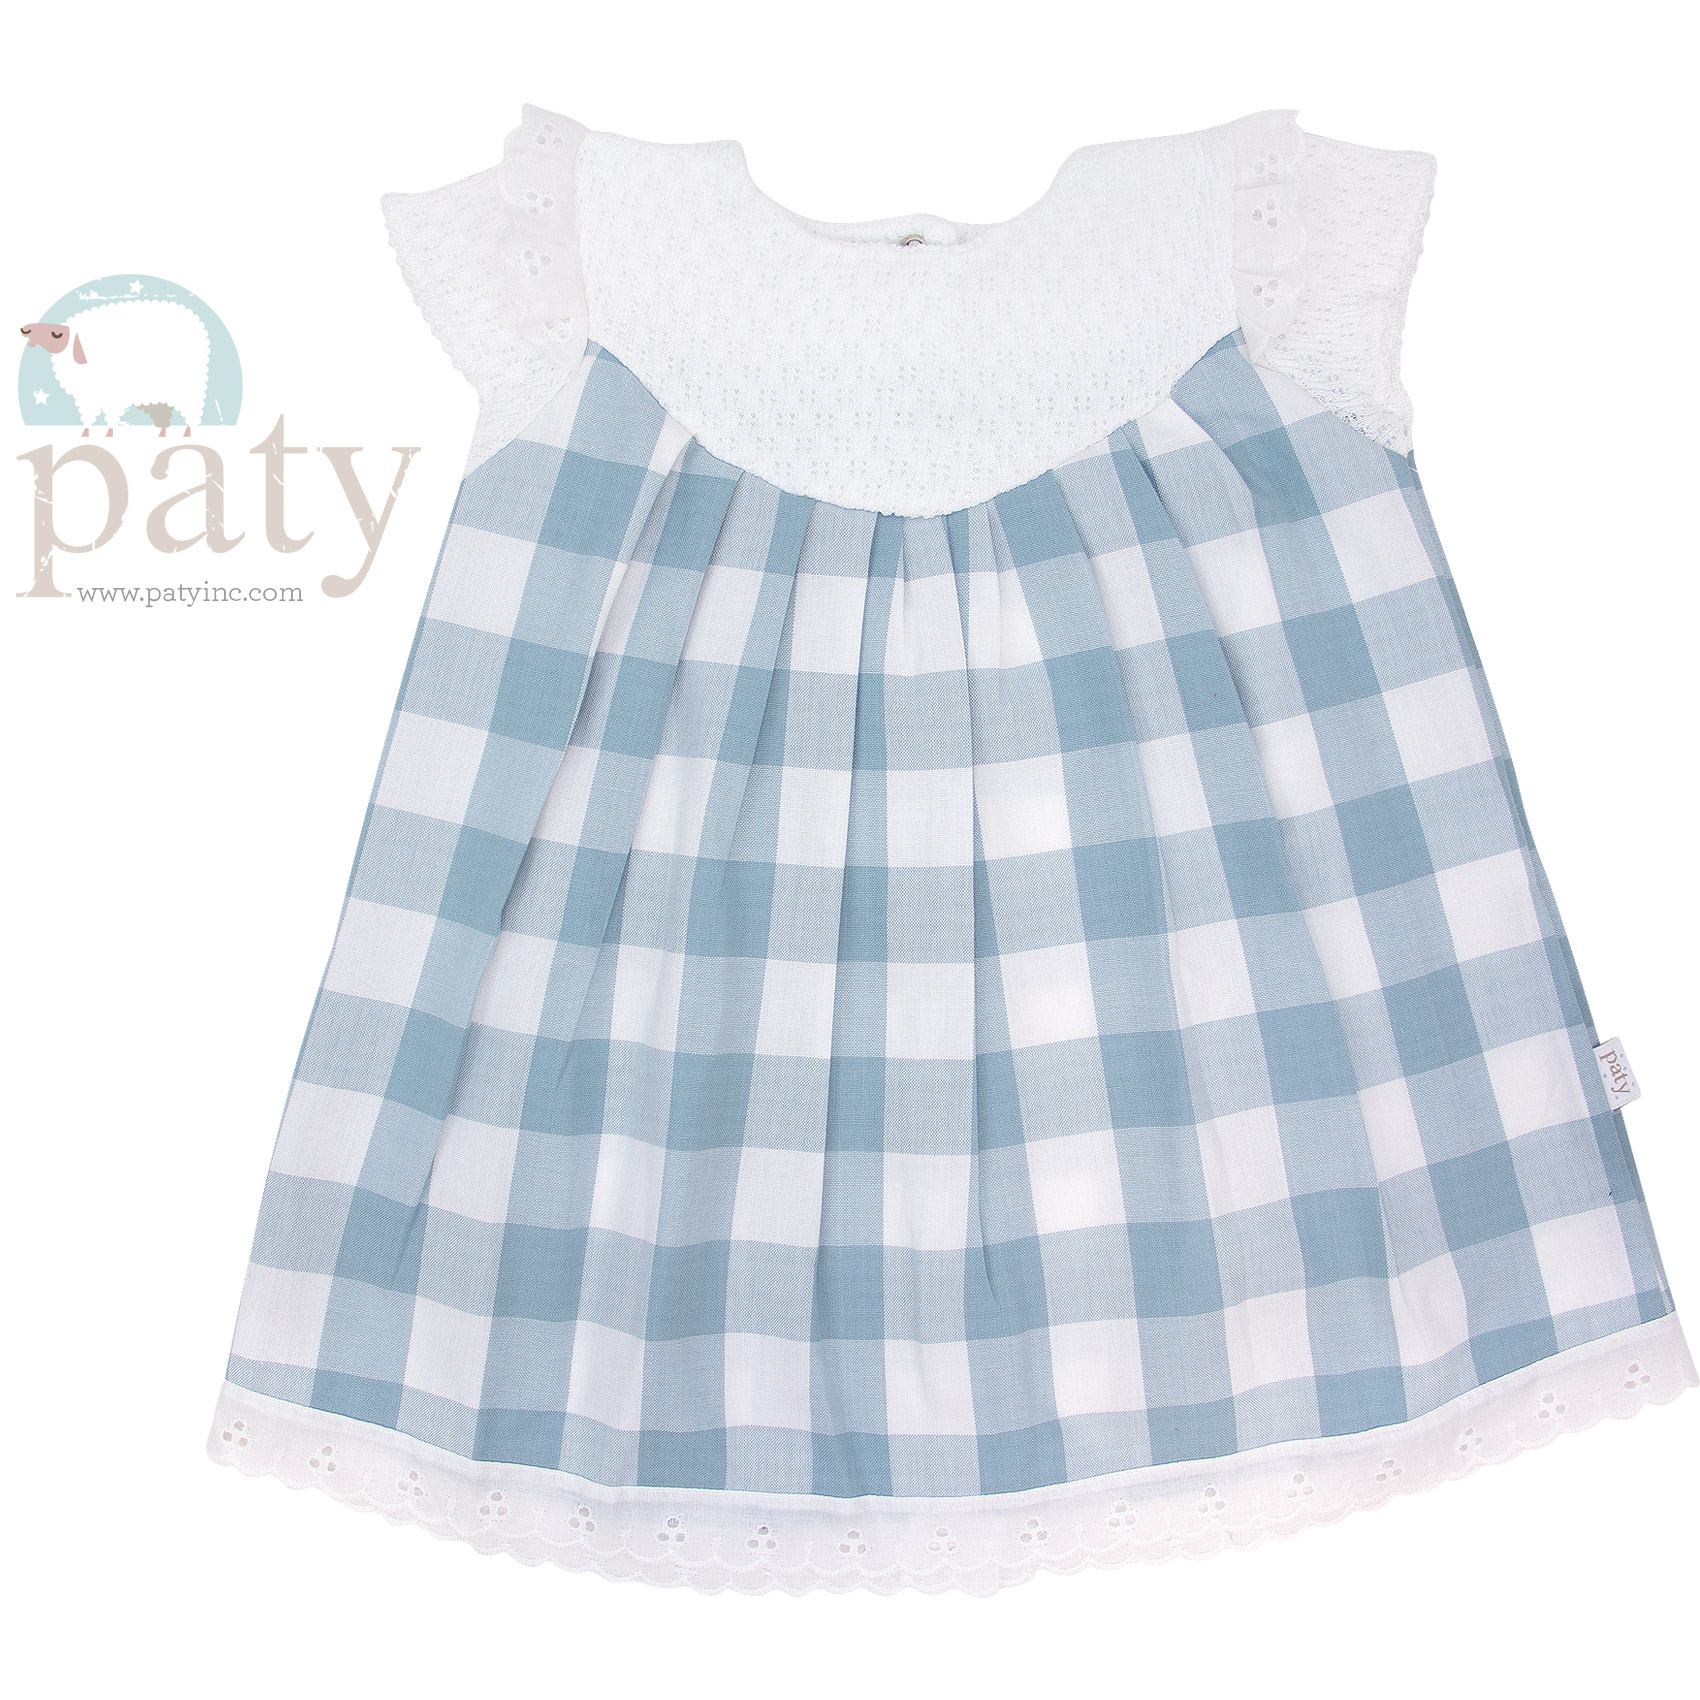 Paty Knit (Check) Dress - Front